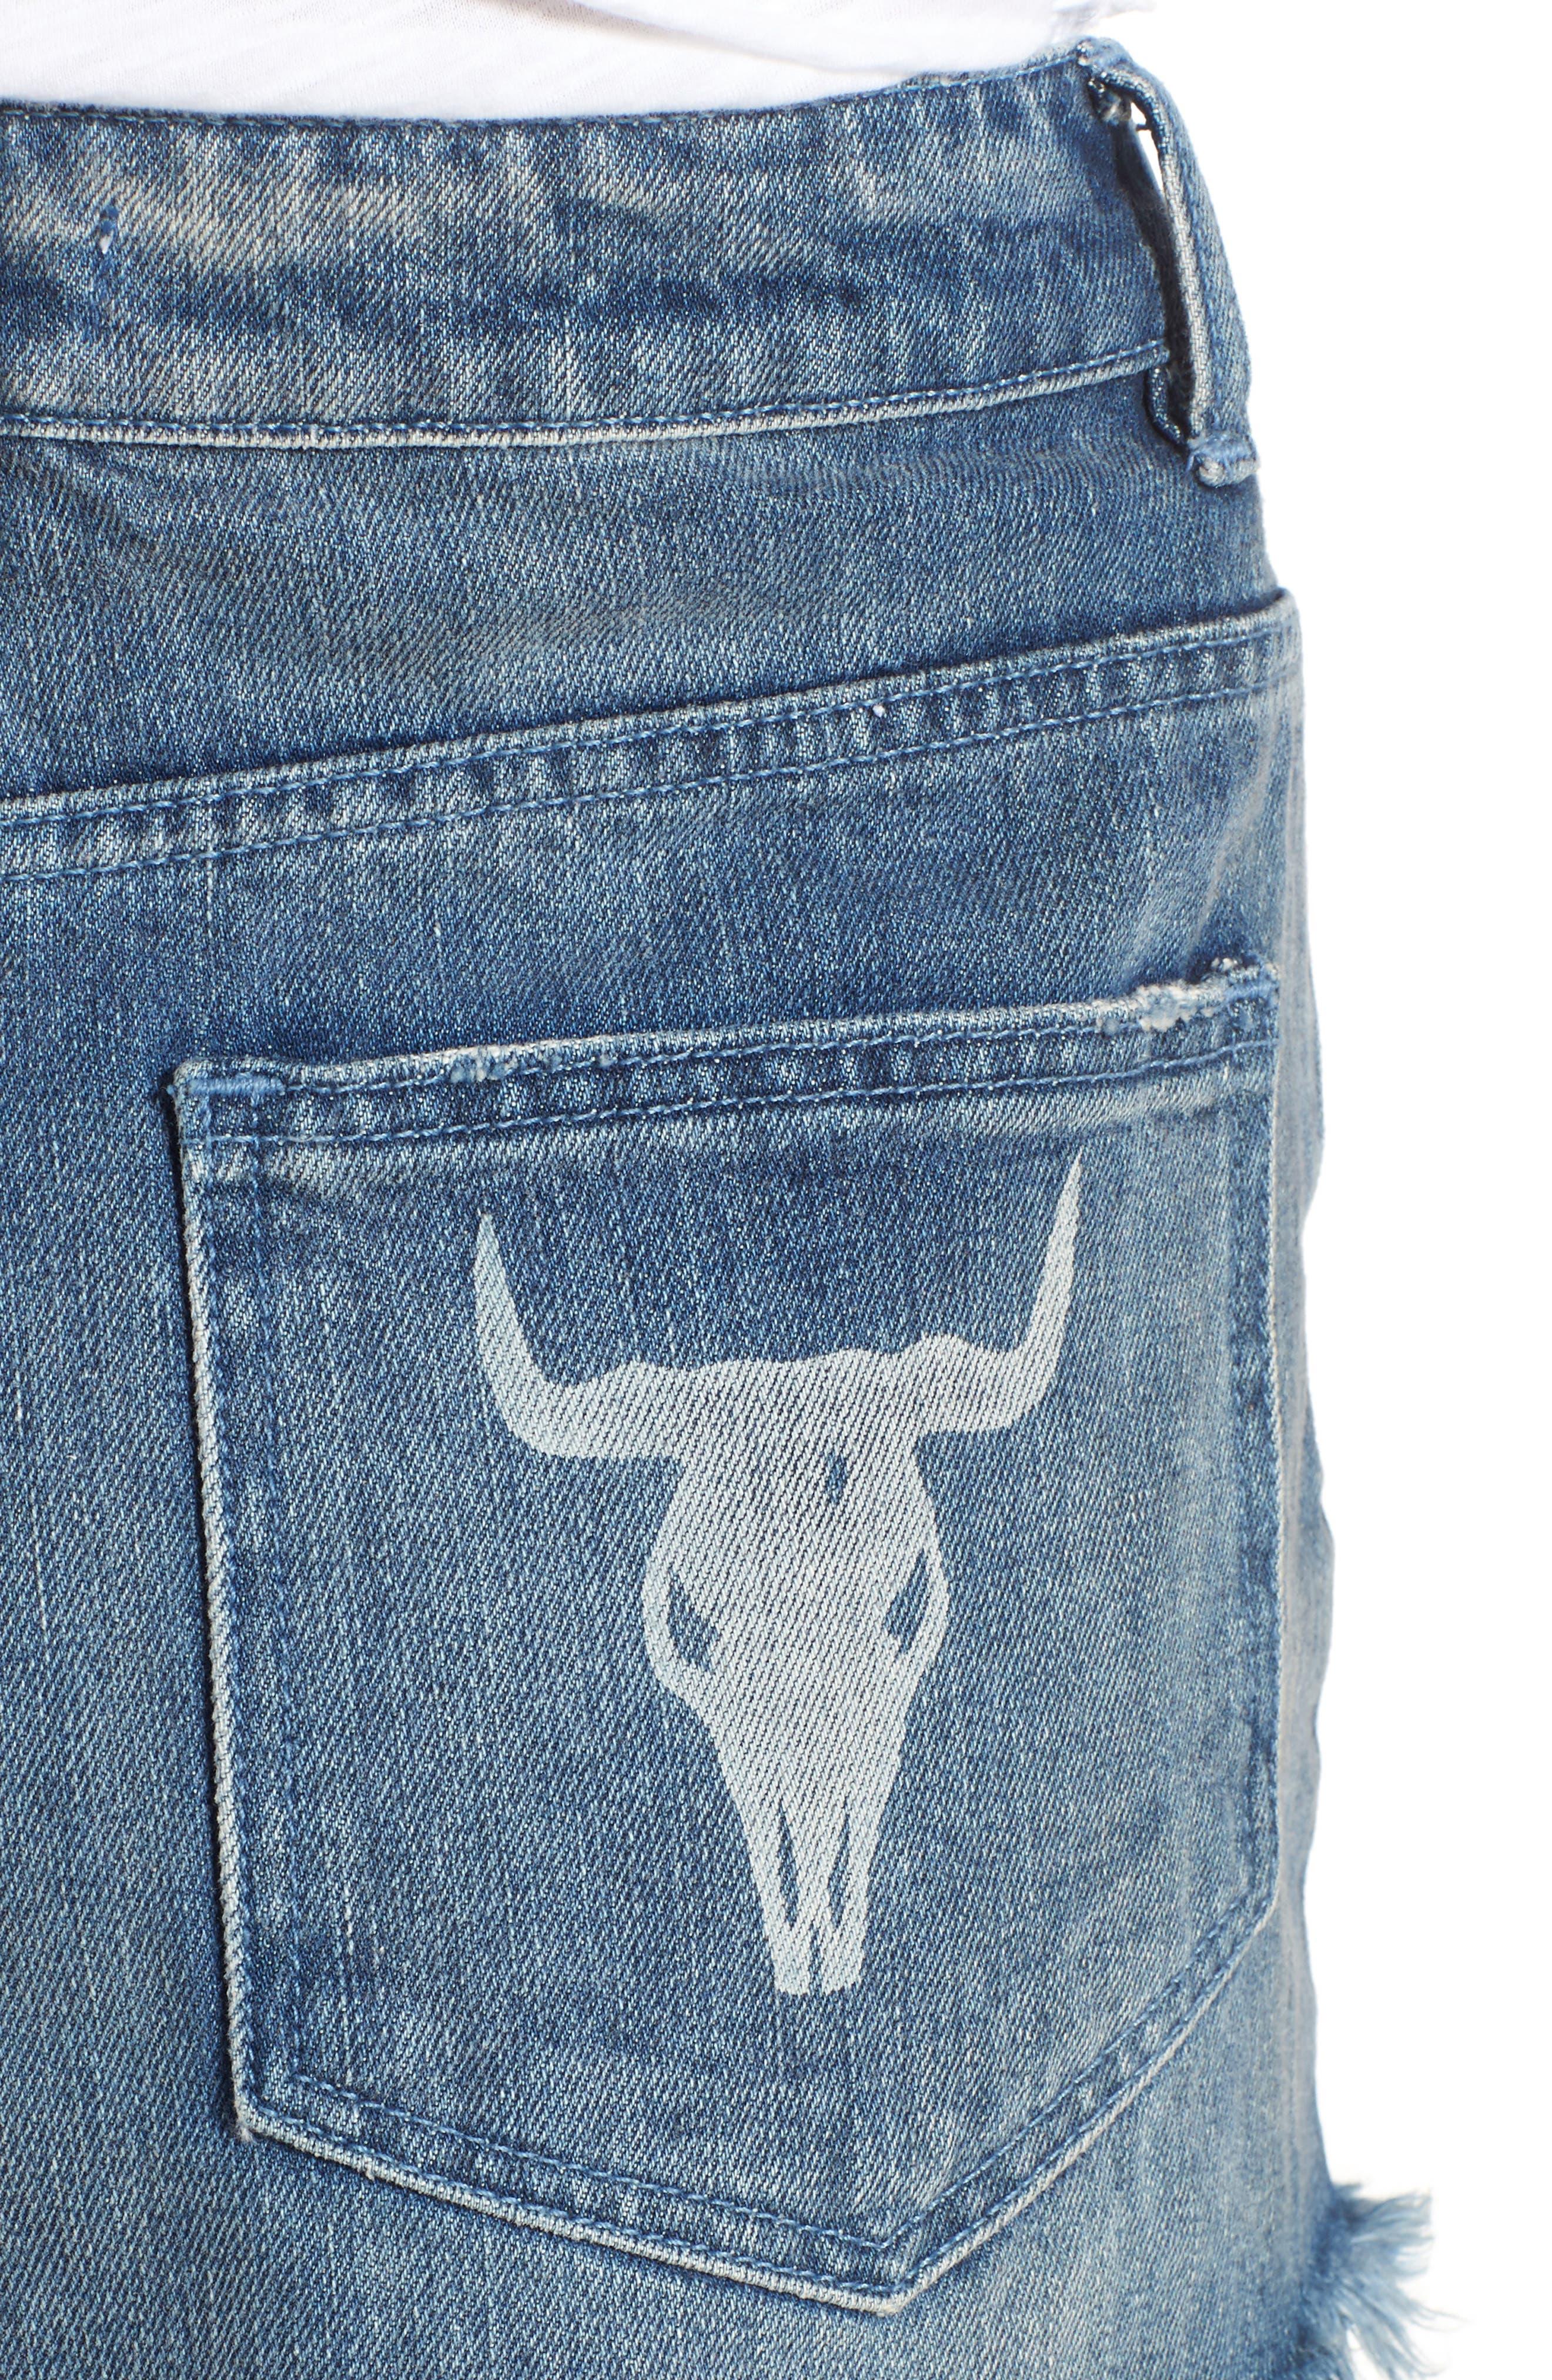 Wyoming High Waist Cutoff Denim Shorts,                             Alternate thumbnail 4, color,                             400